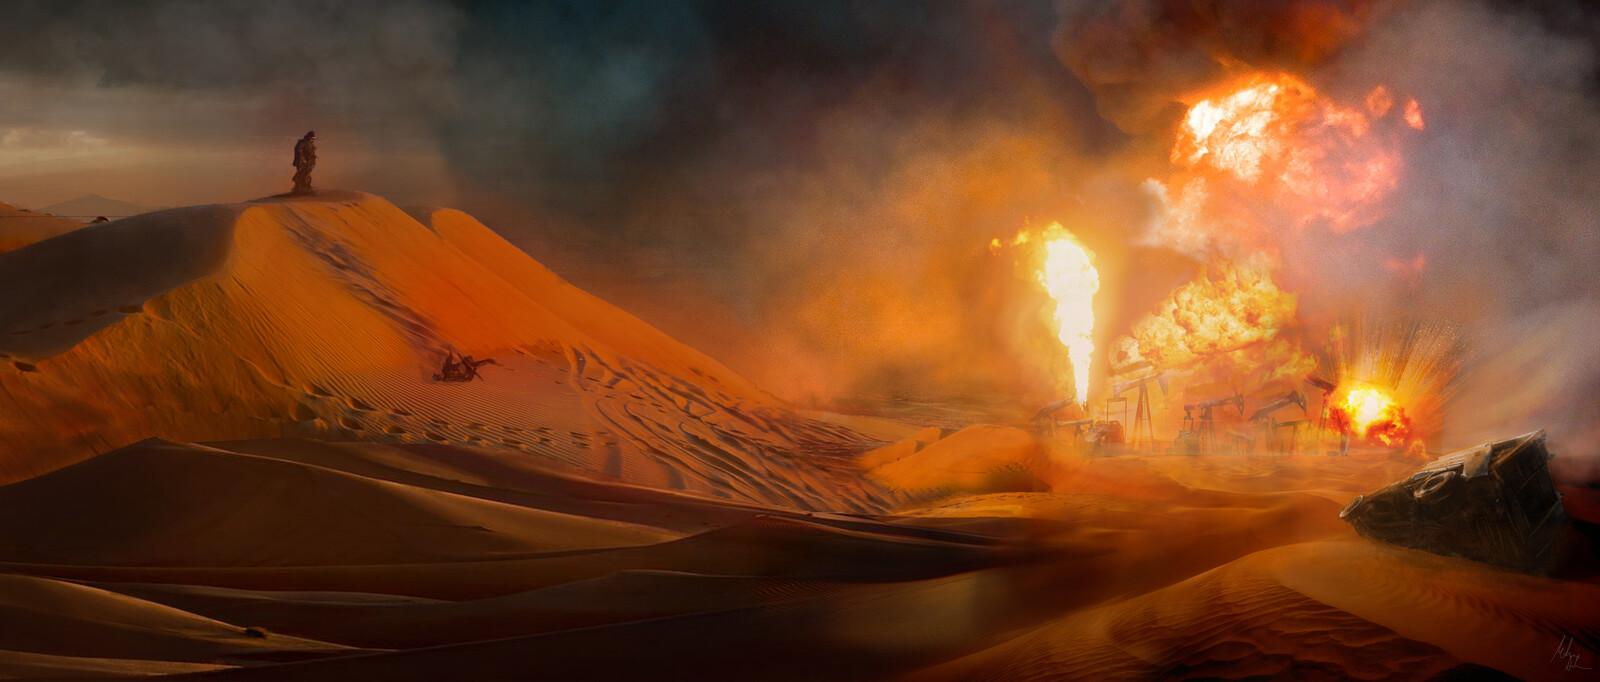 war in desert